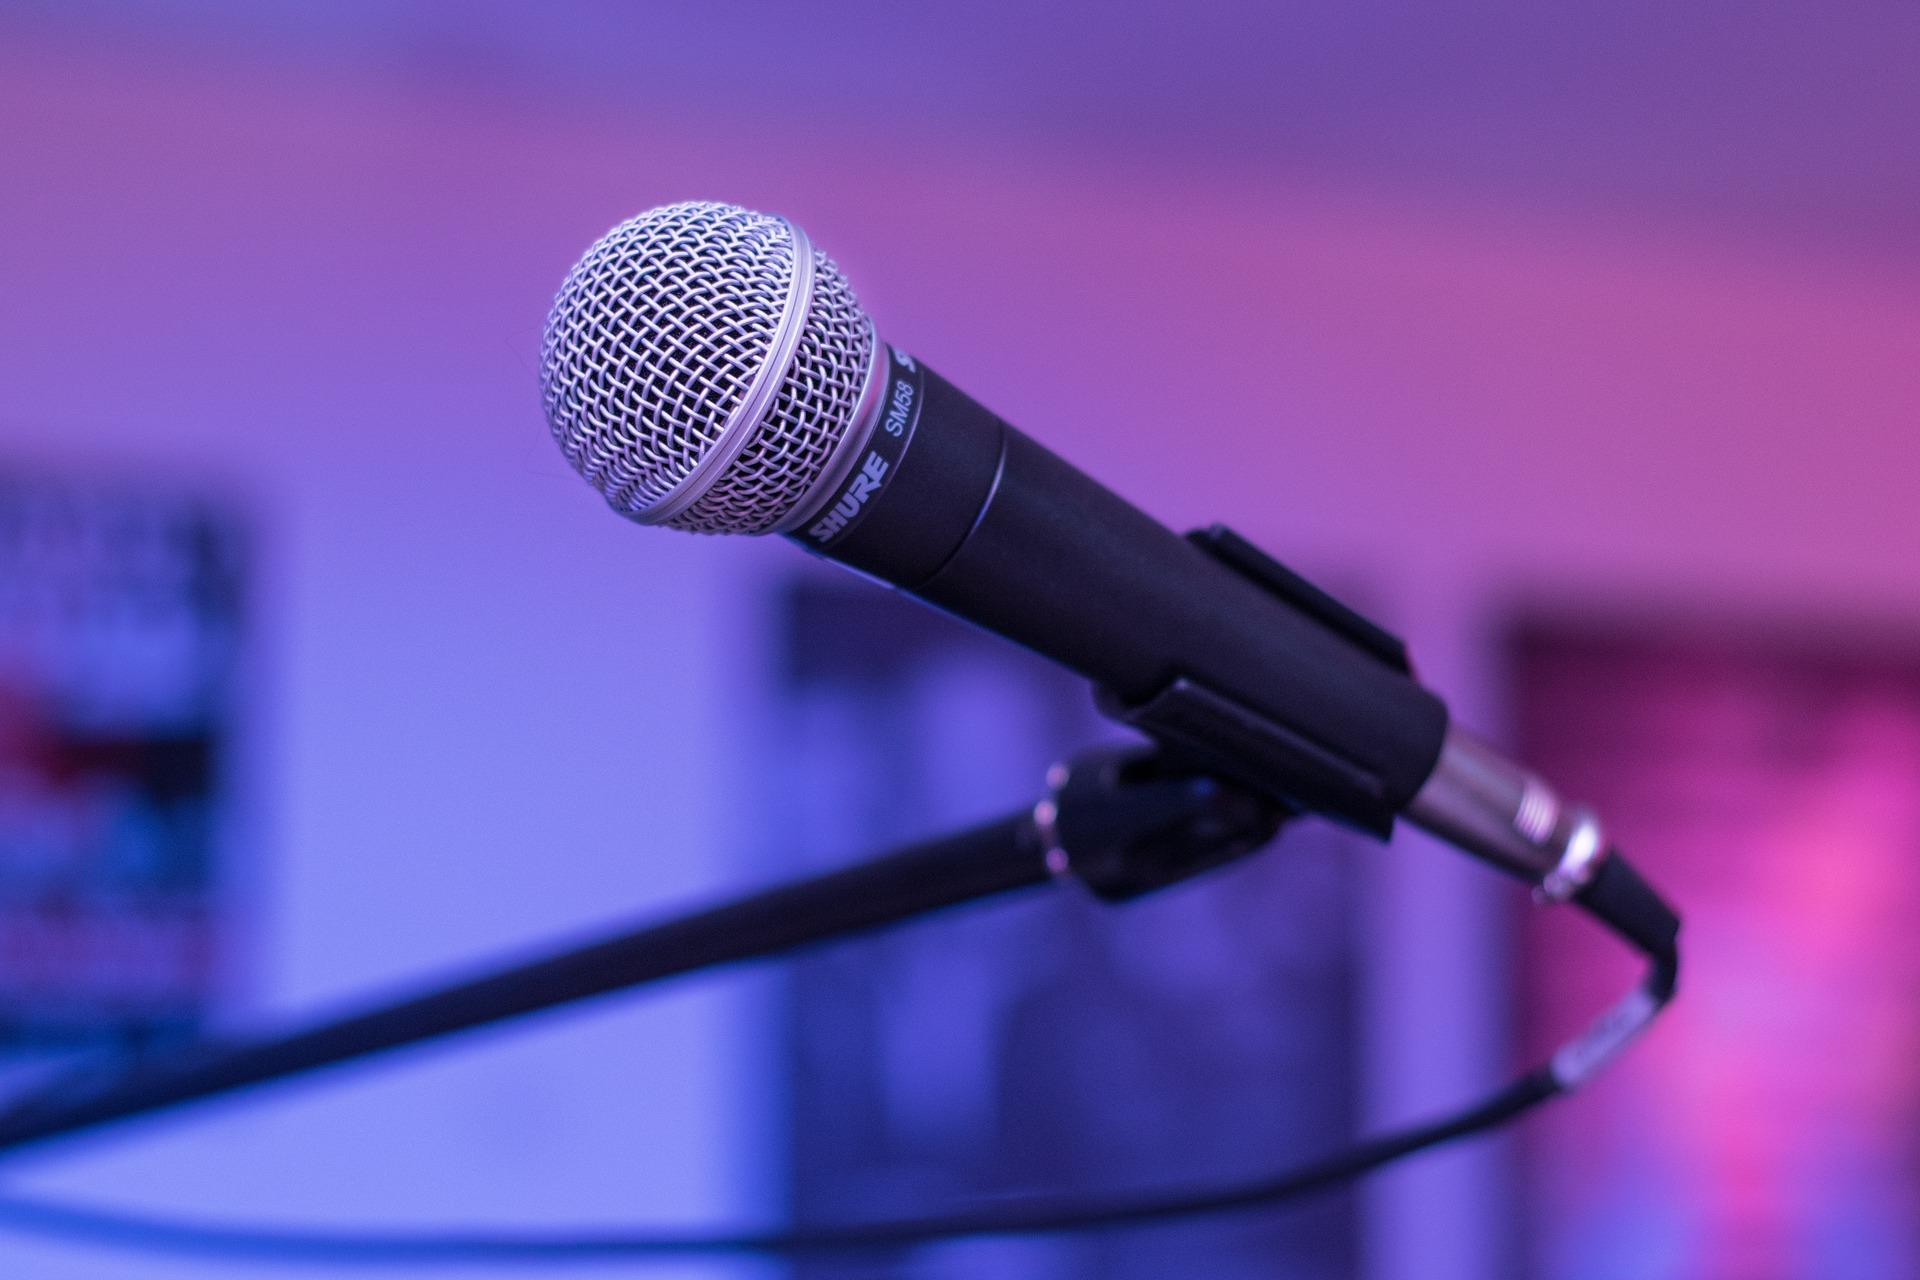 Представители Дворца культуры Щербинки открыли набор на занятия по вокалу